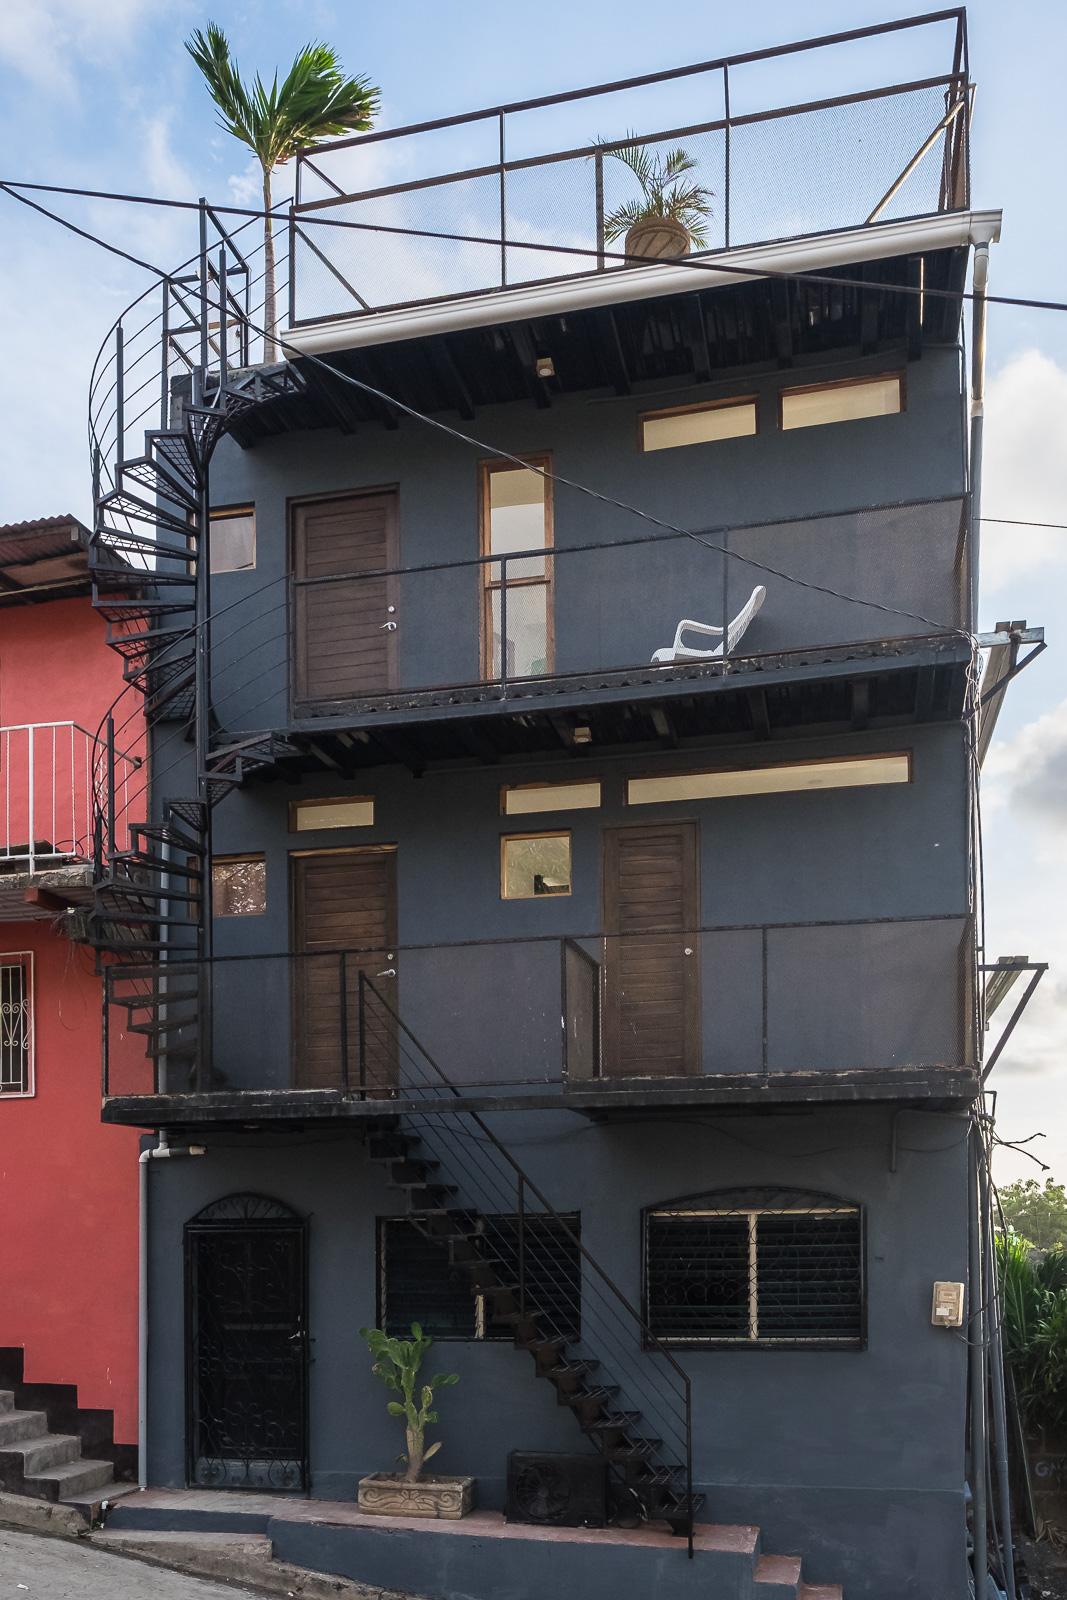 Property for sale in San Juan Del Sur Nicaragua, Social House 17.jpg